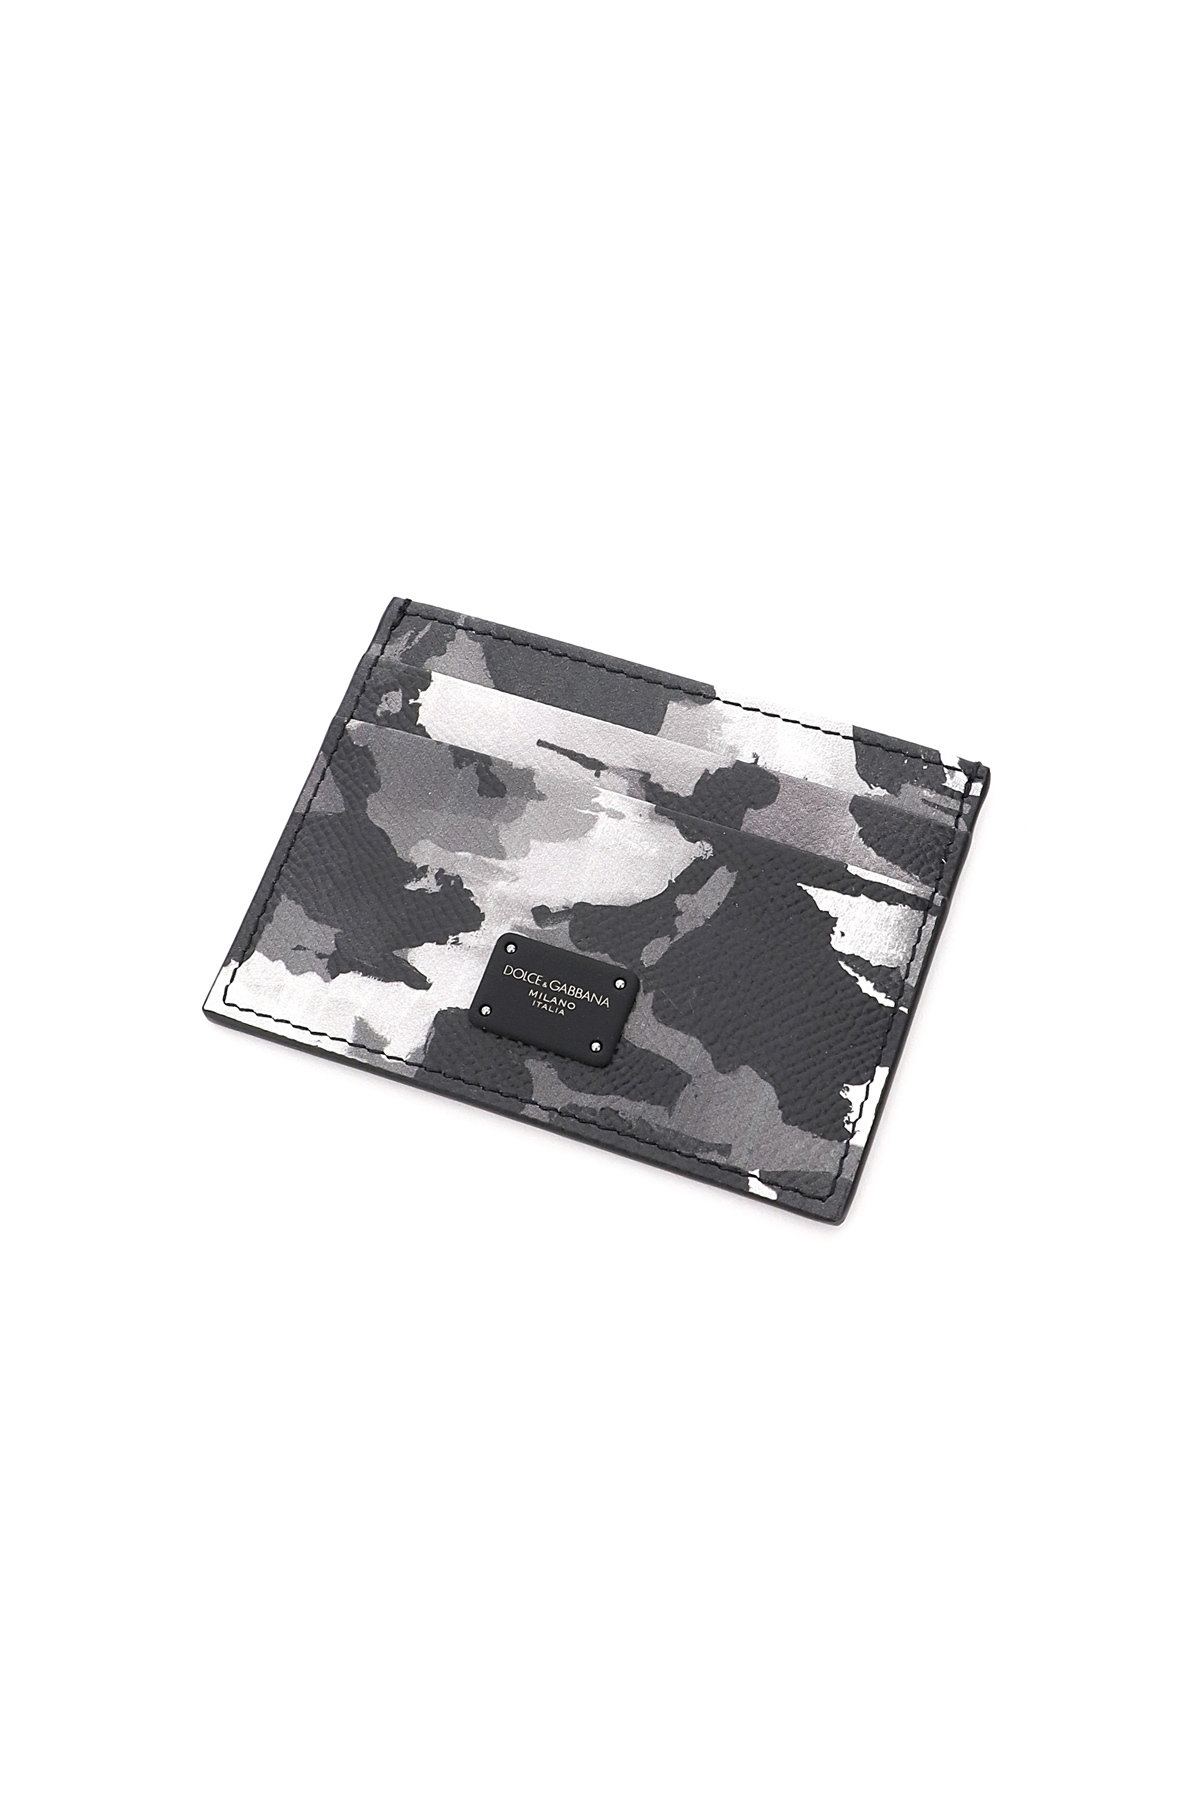 Dolce & gabbana portacarte stampa camouflage